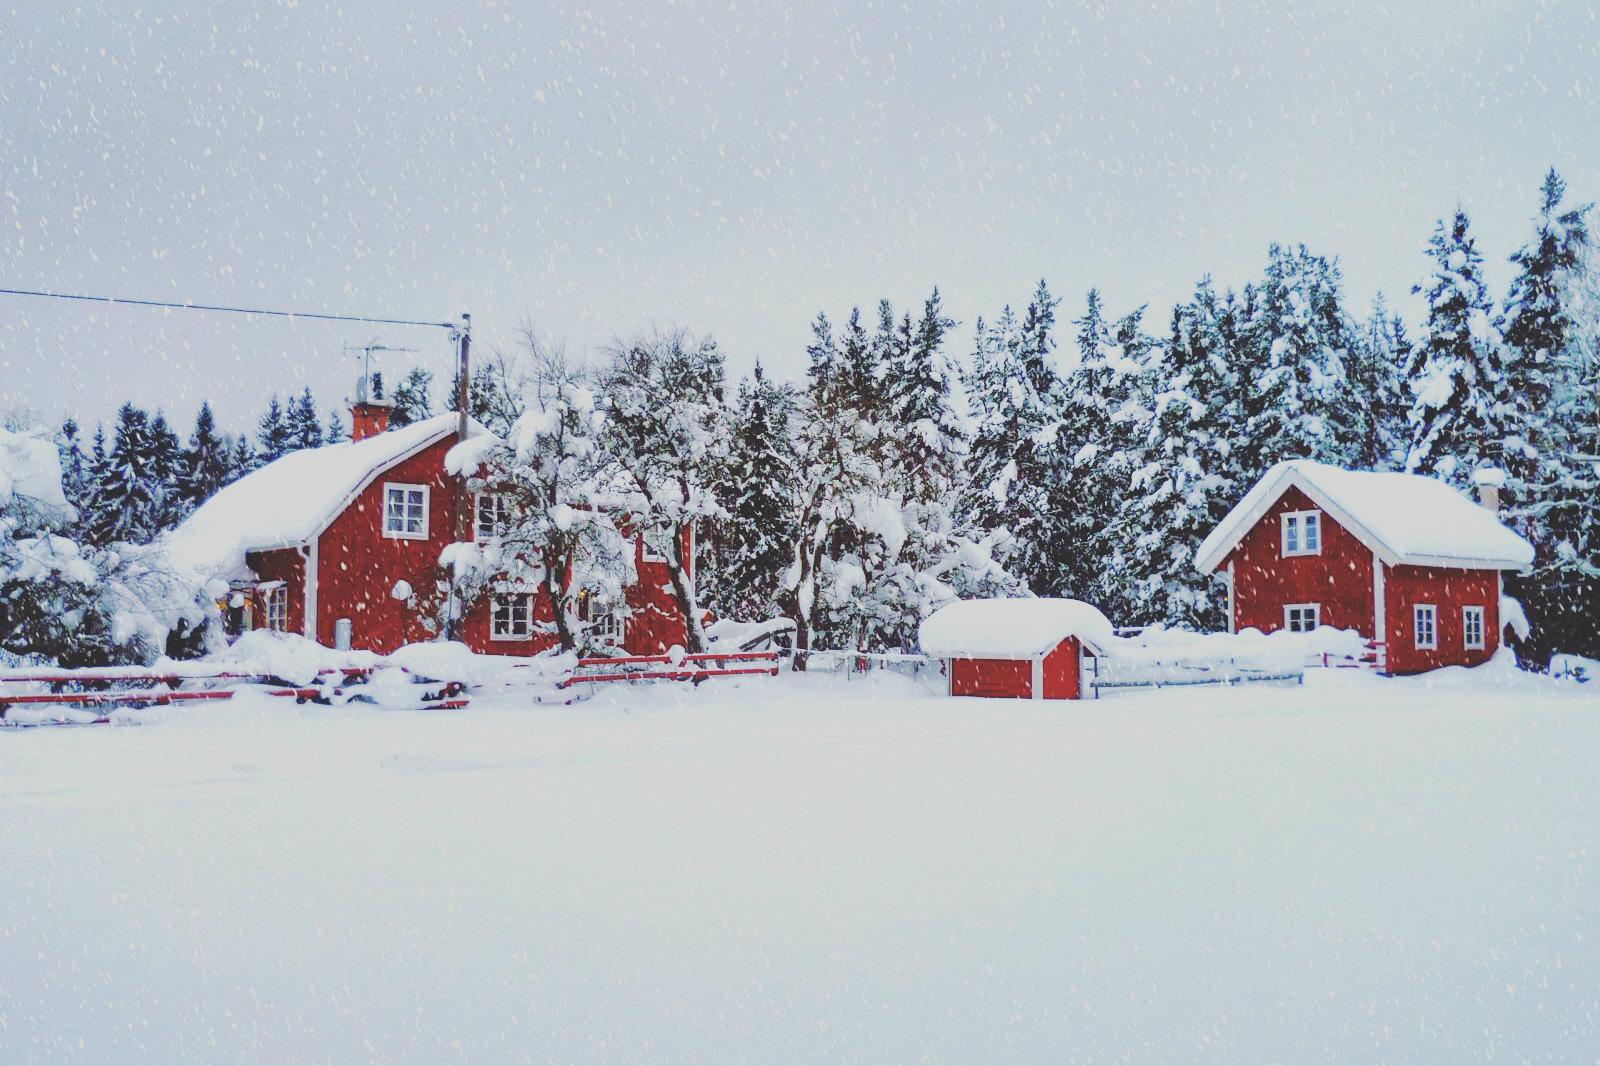 Silvester-Reiseziele in der Natur - Silvester im Schnee